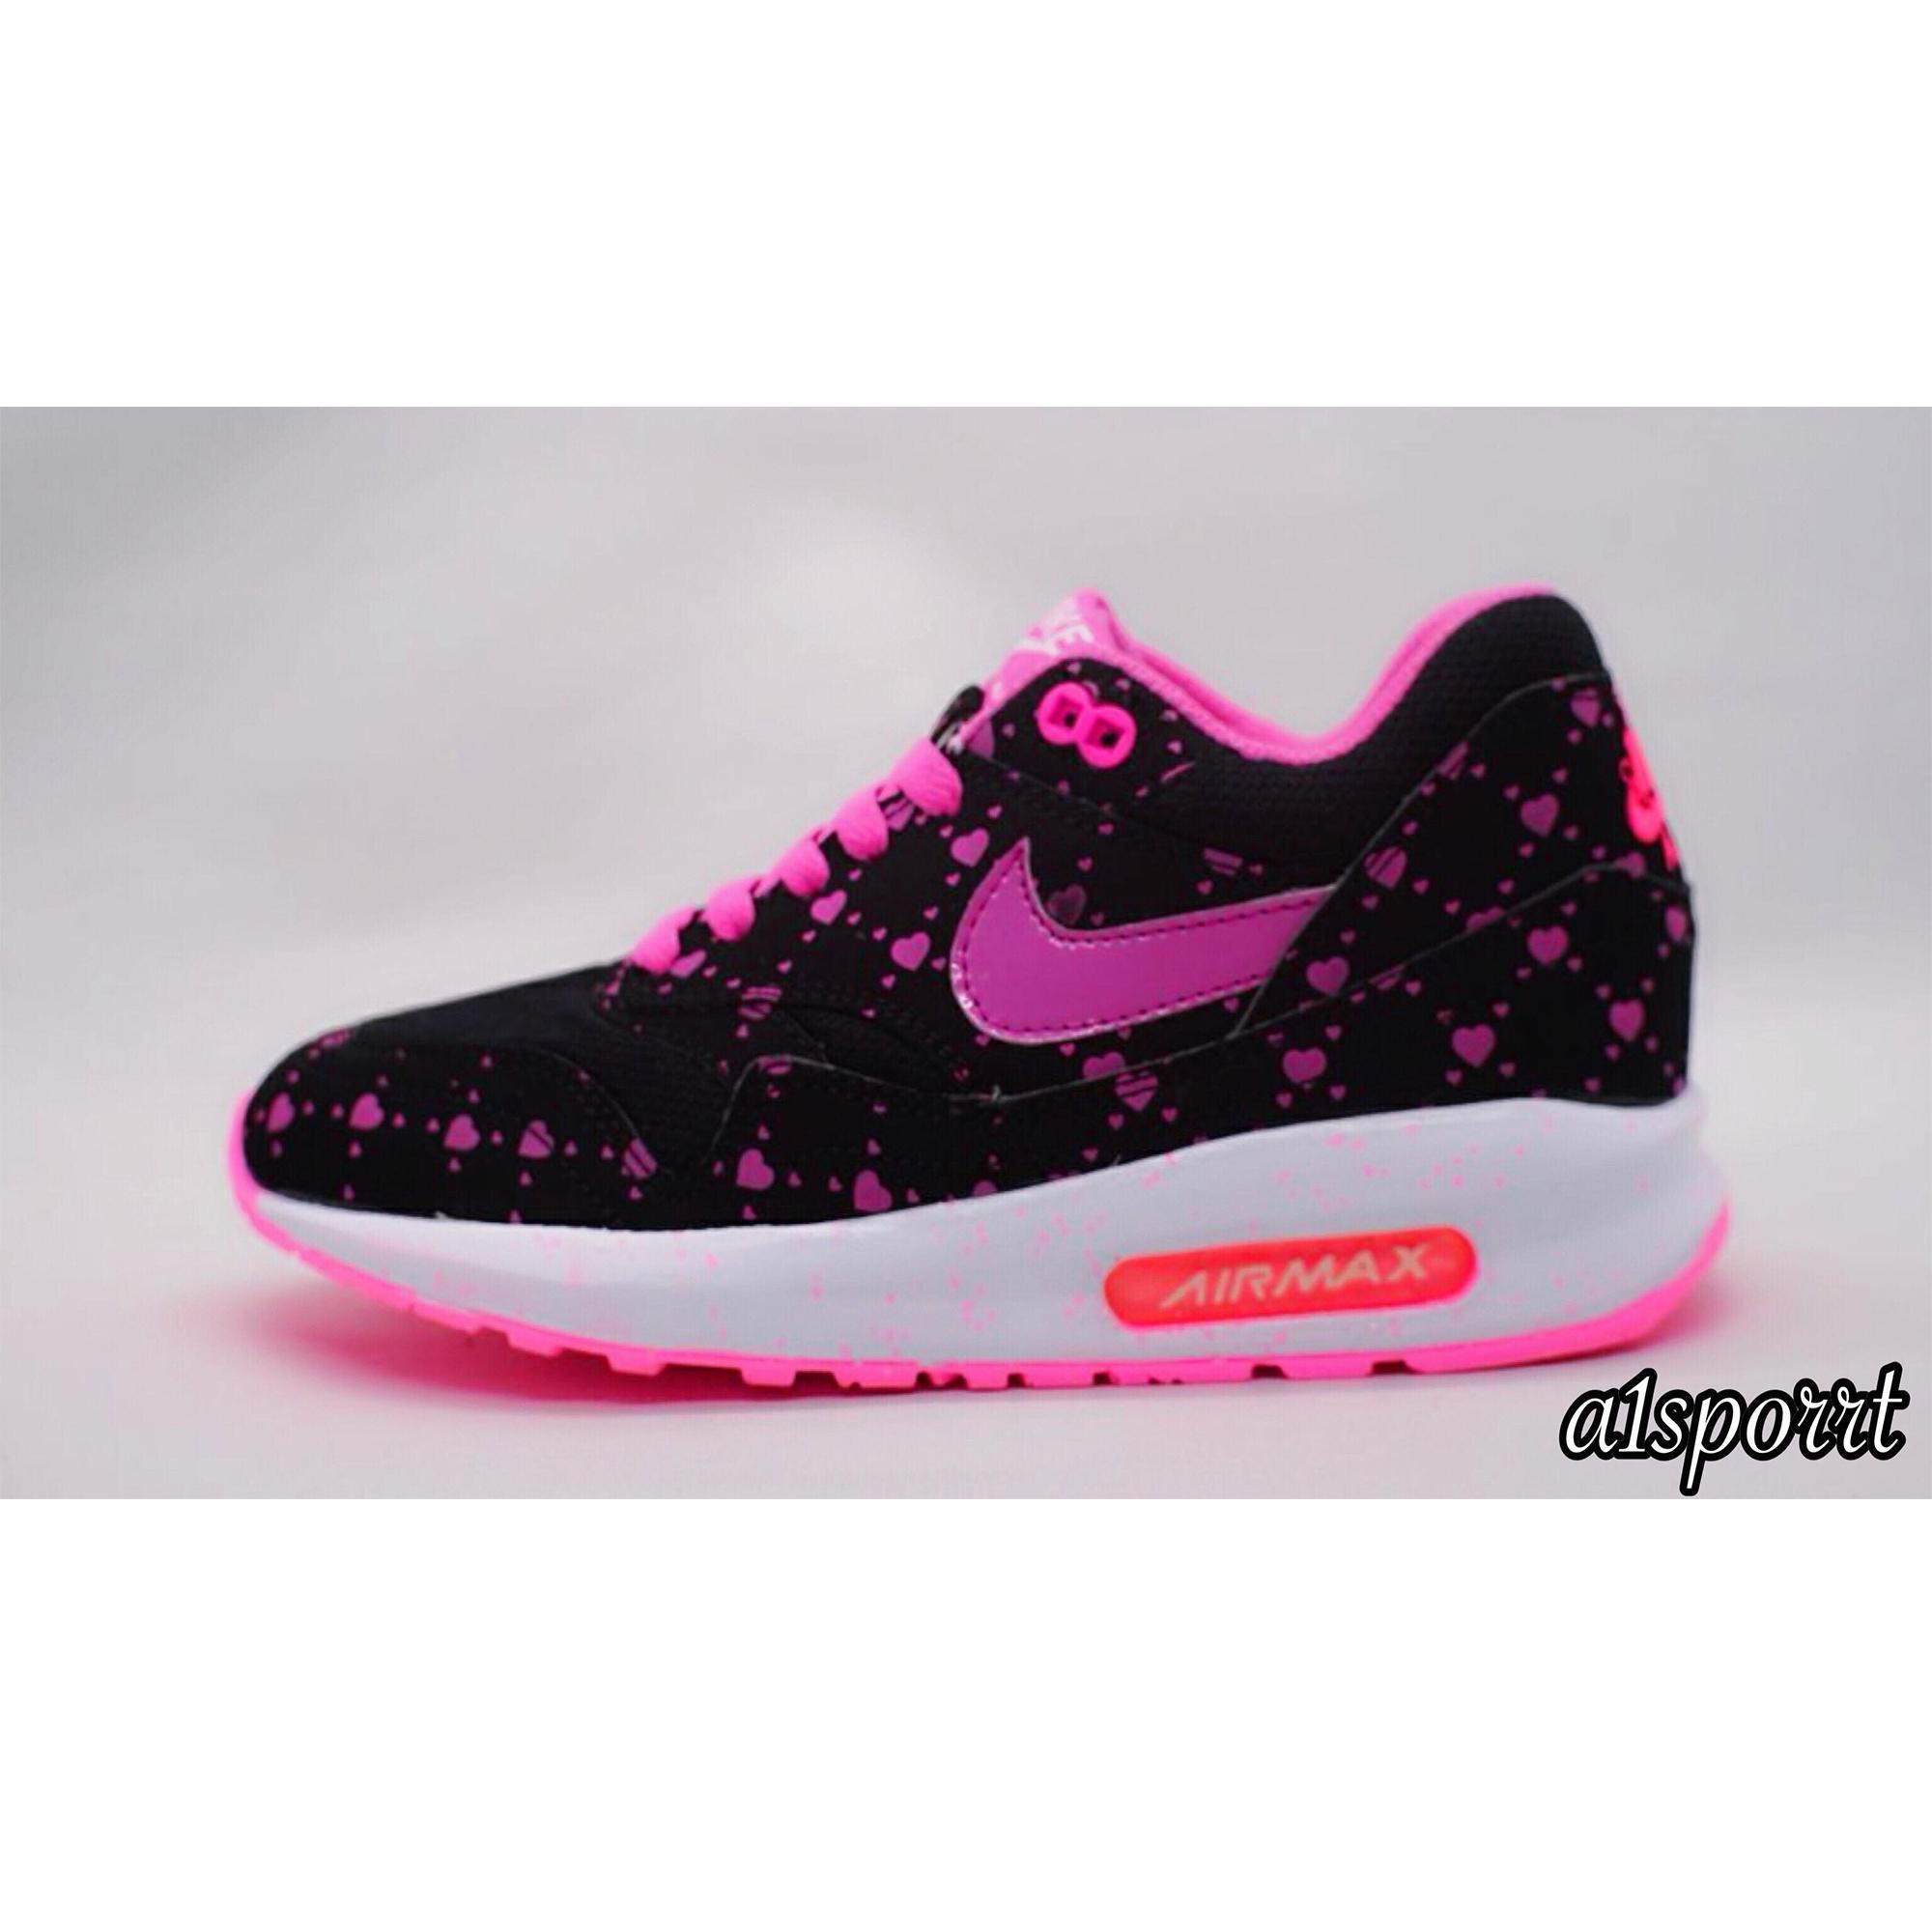 Nike Airmax Kualitas Premium Hitam Pink Love Lunar